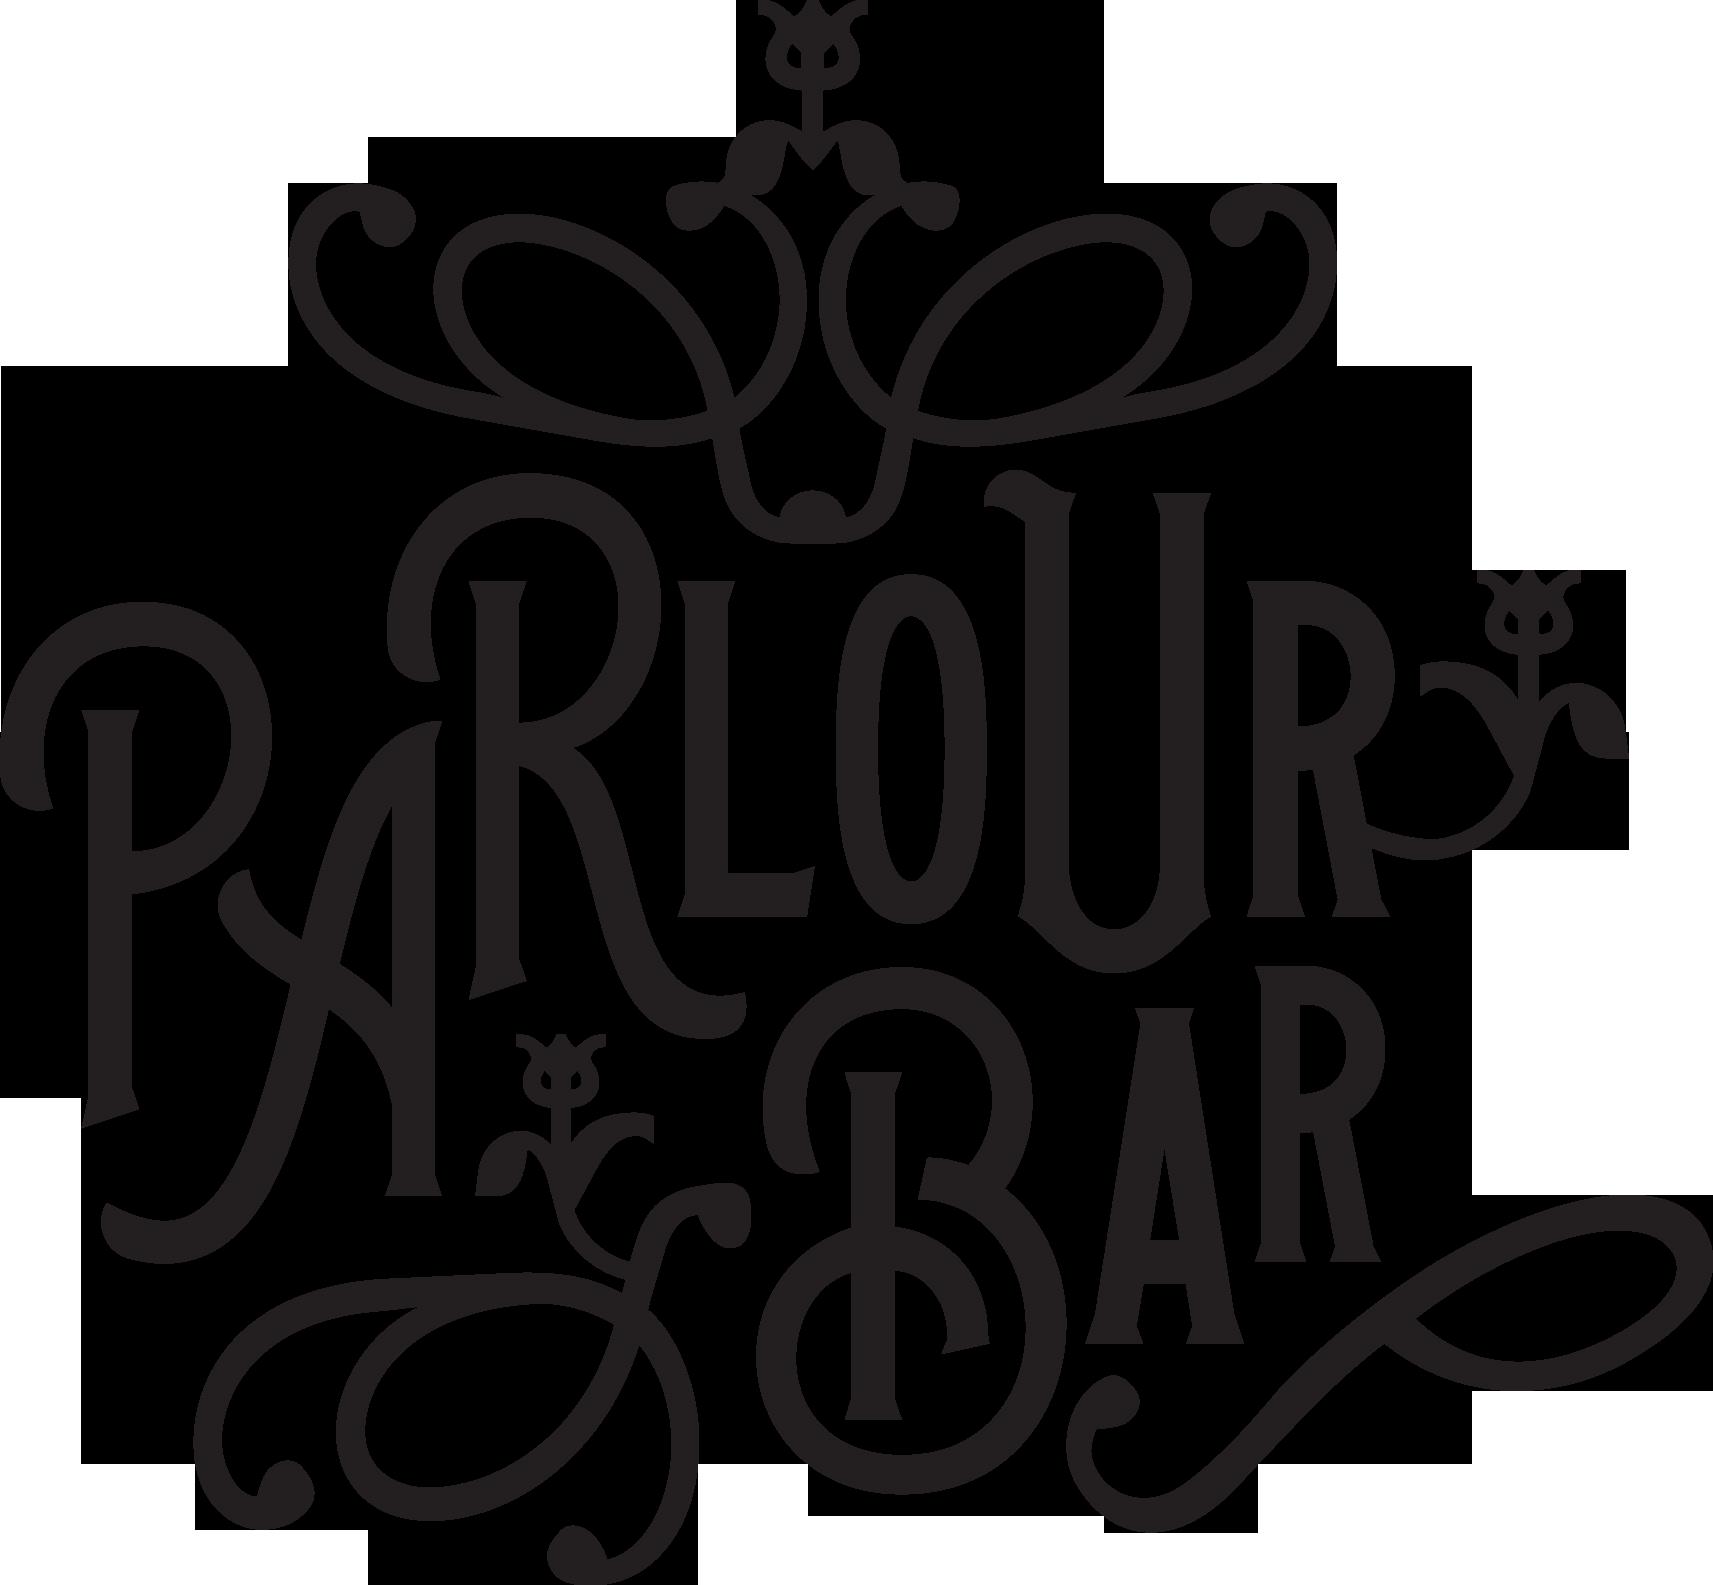 PARLOUR BAR_LOGO_BLACK.png